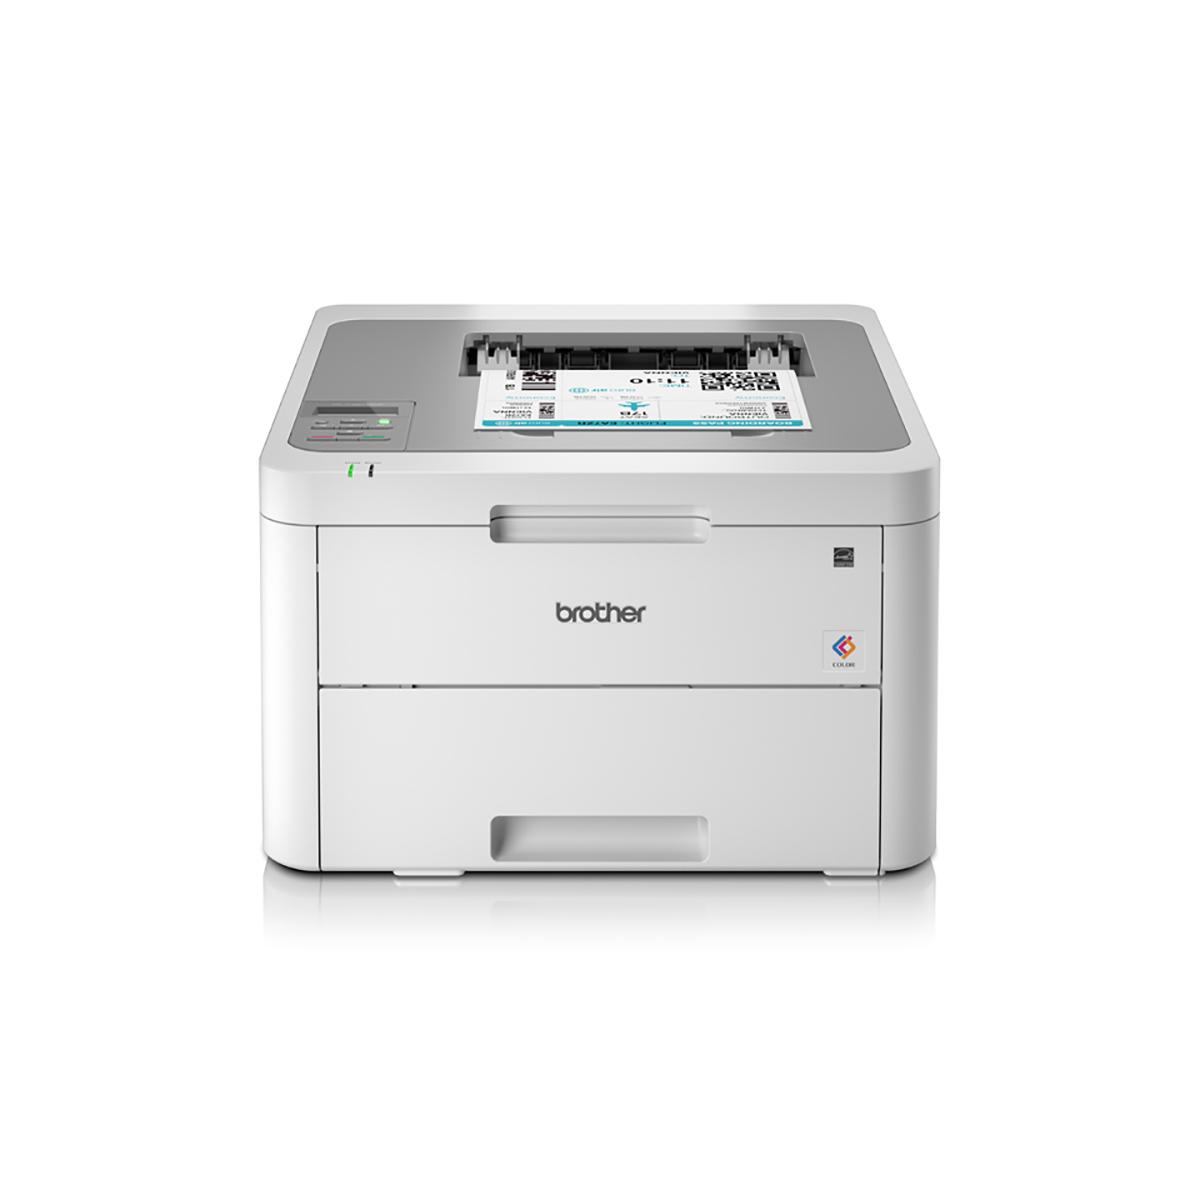 Brother HL-L3210CW Colour LED A4 Laser Printer